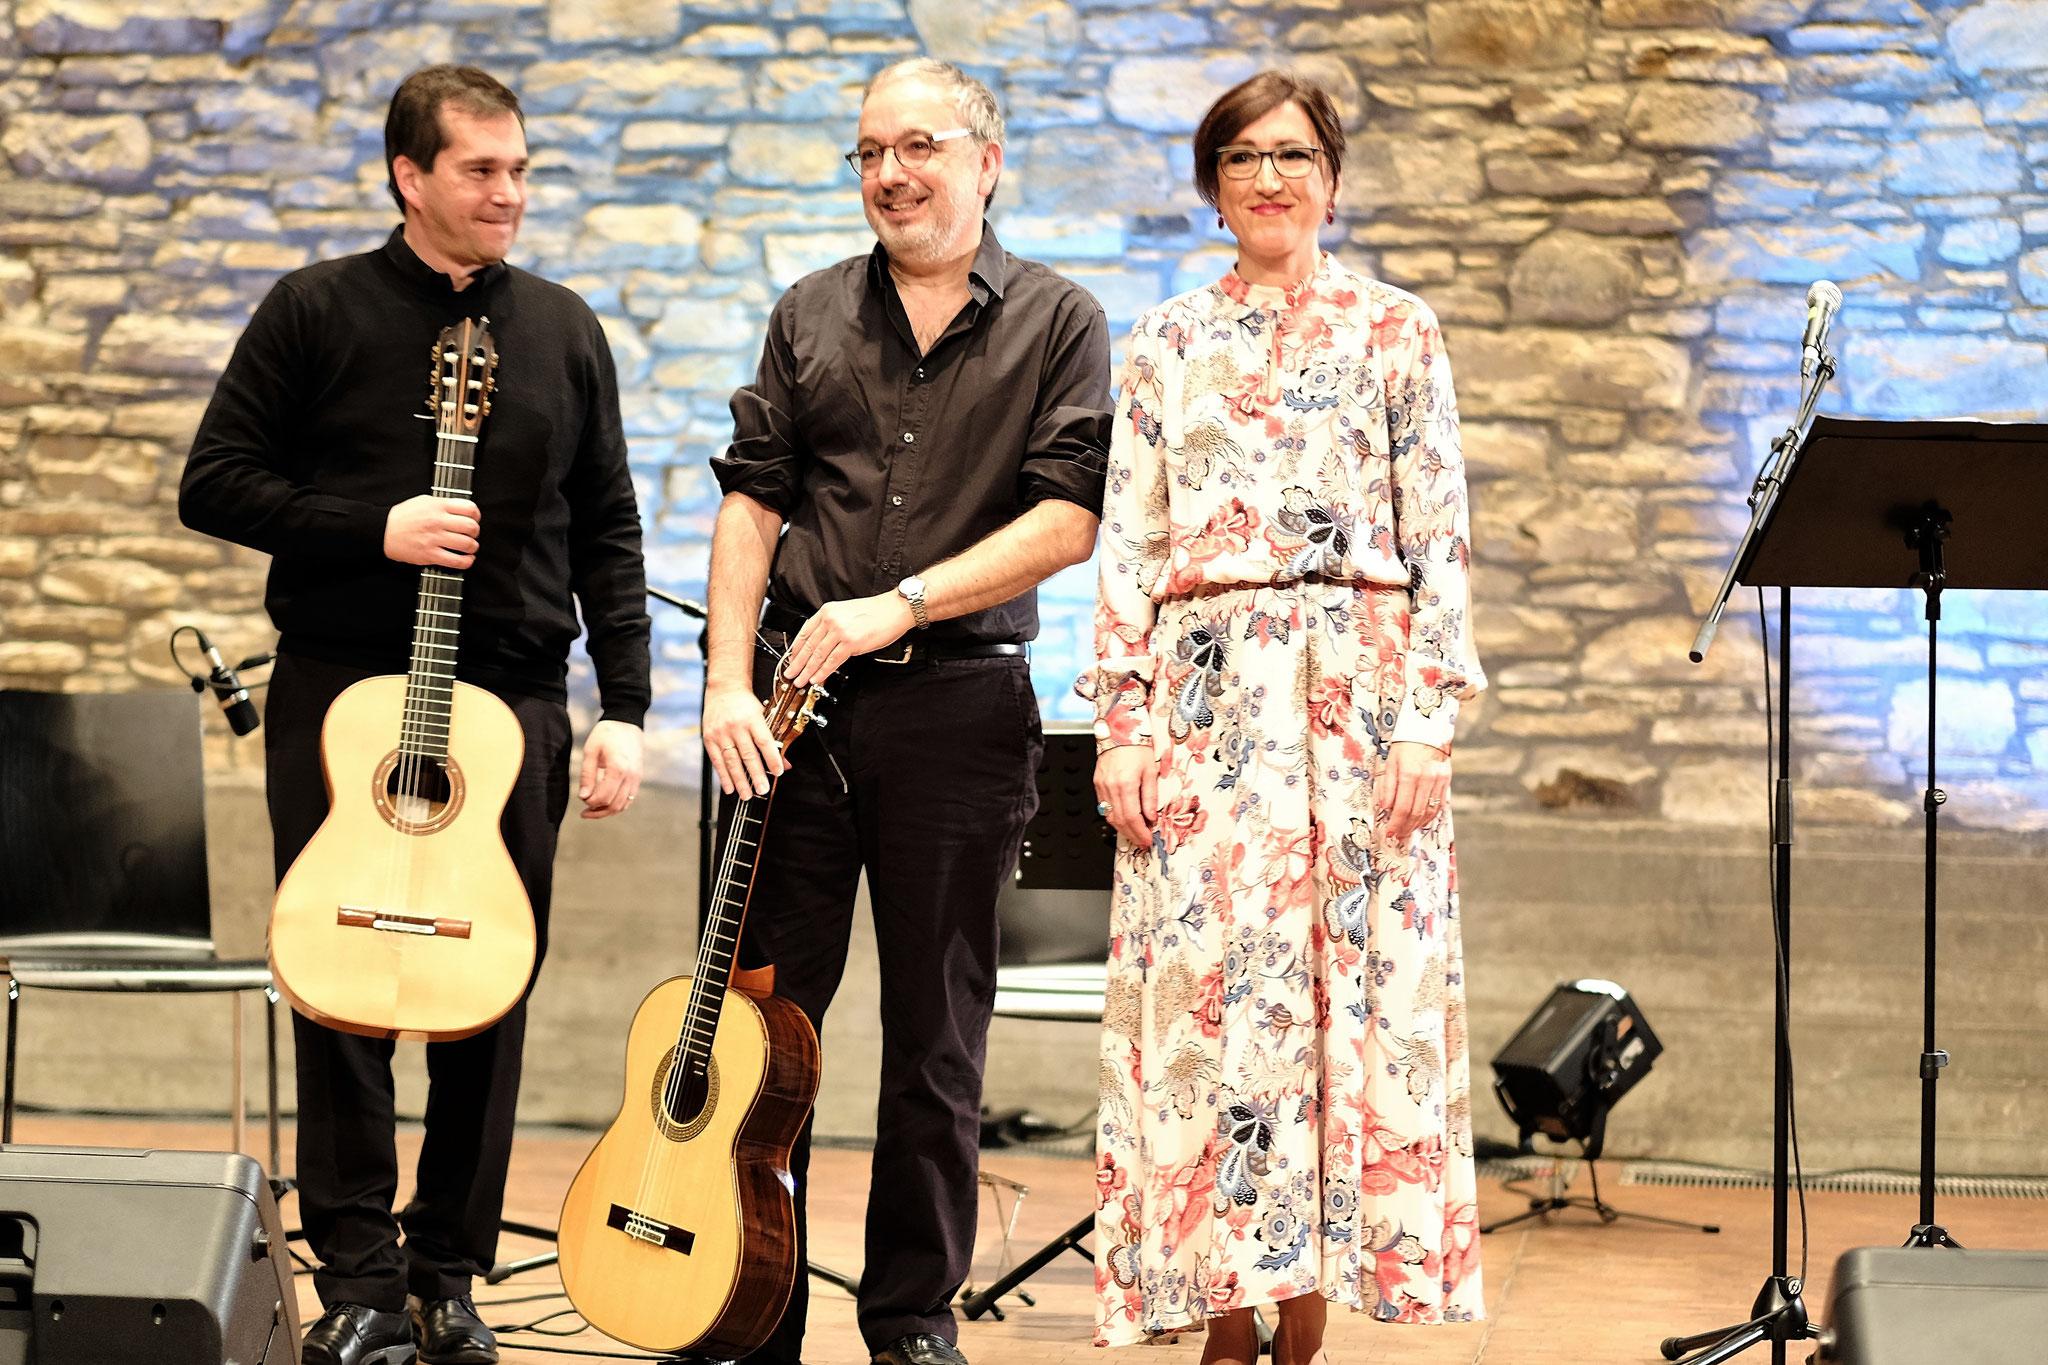 Marco Squicciarini, Rafael Andreo, Manoli Ramirez de Arellano